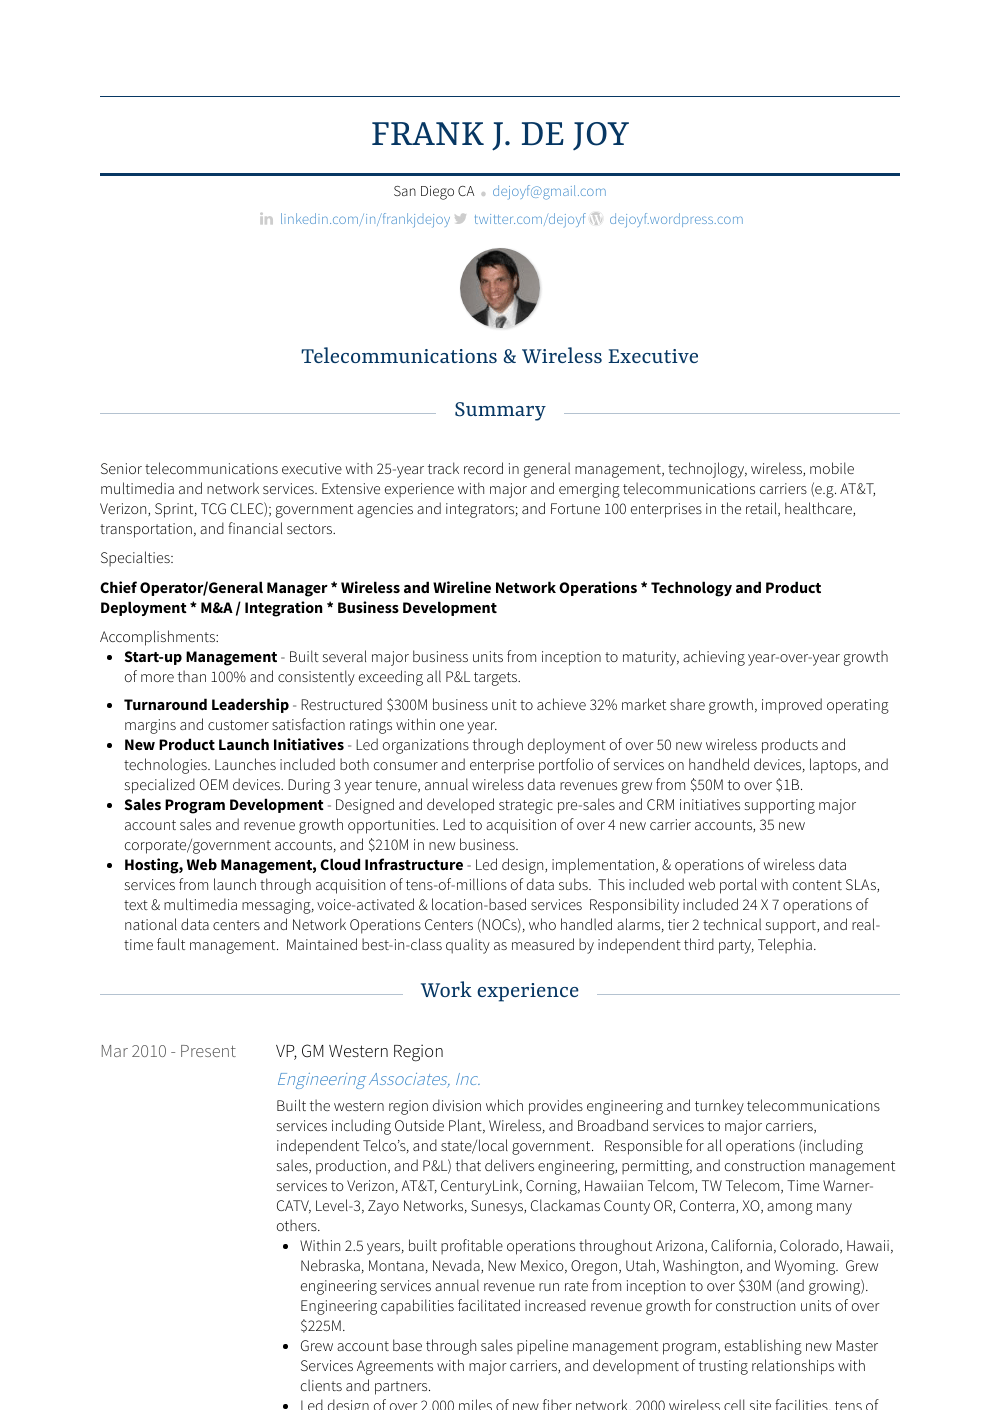 Gm Resume Sample